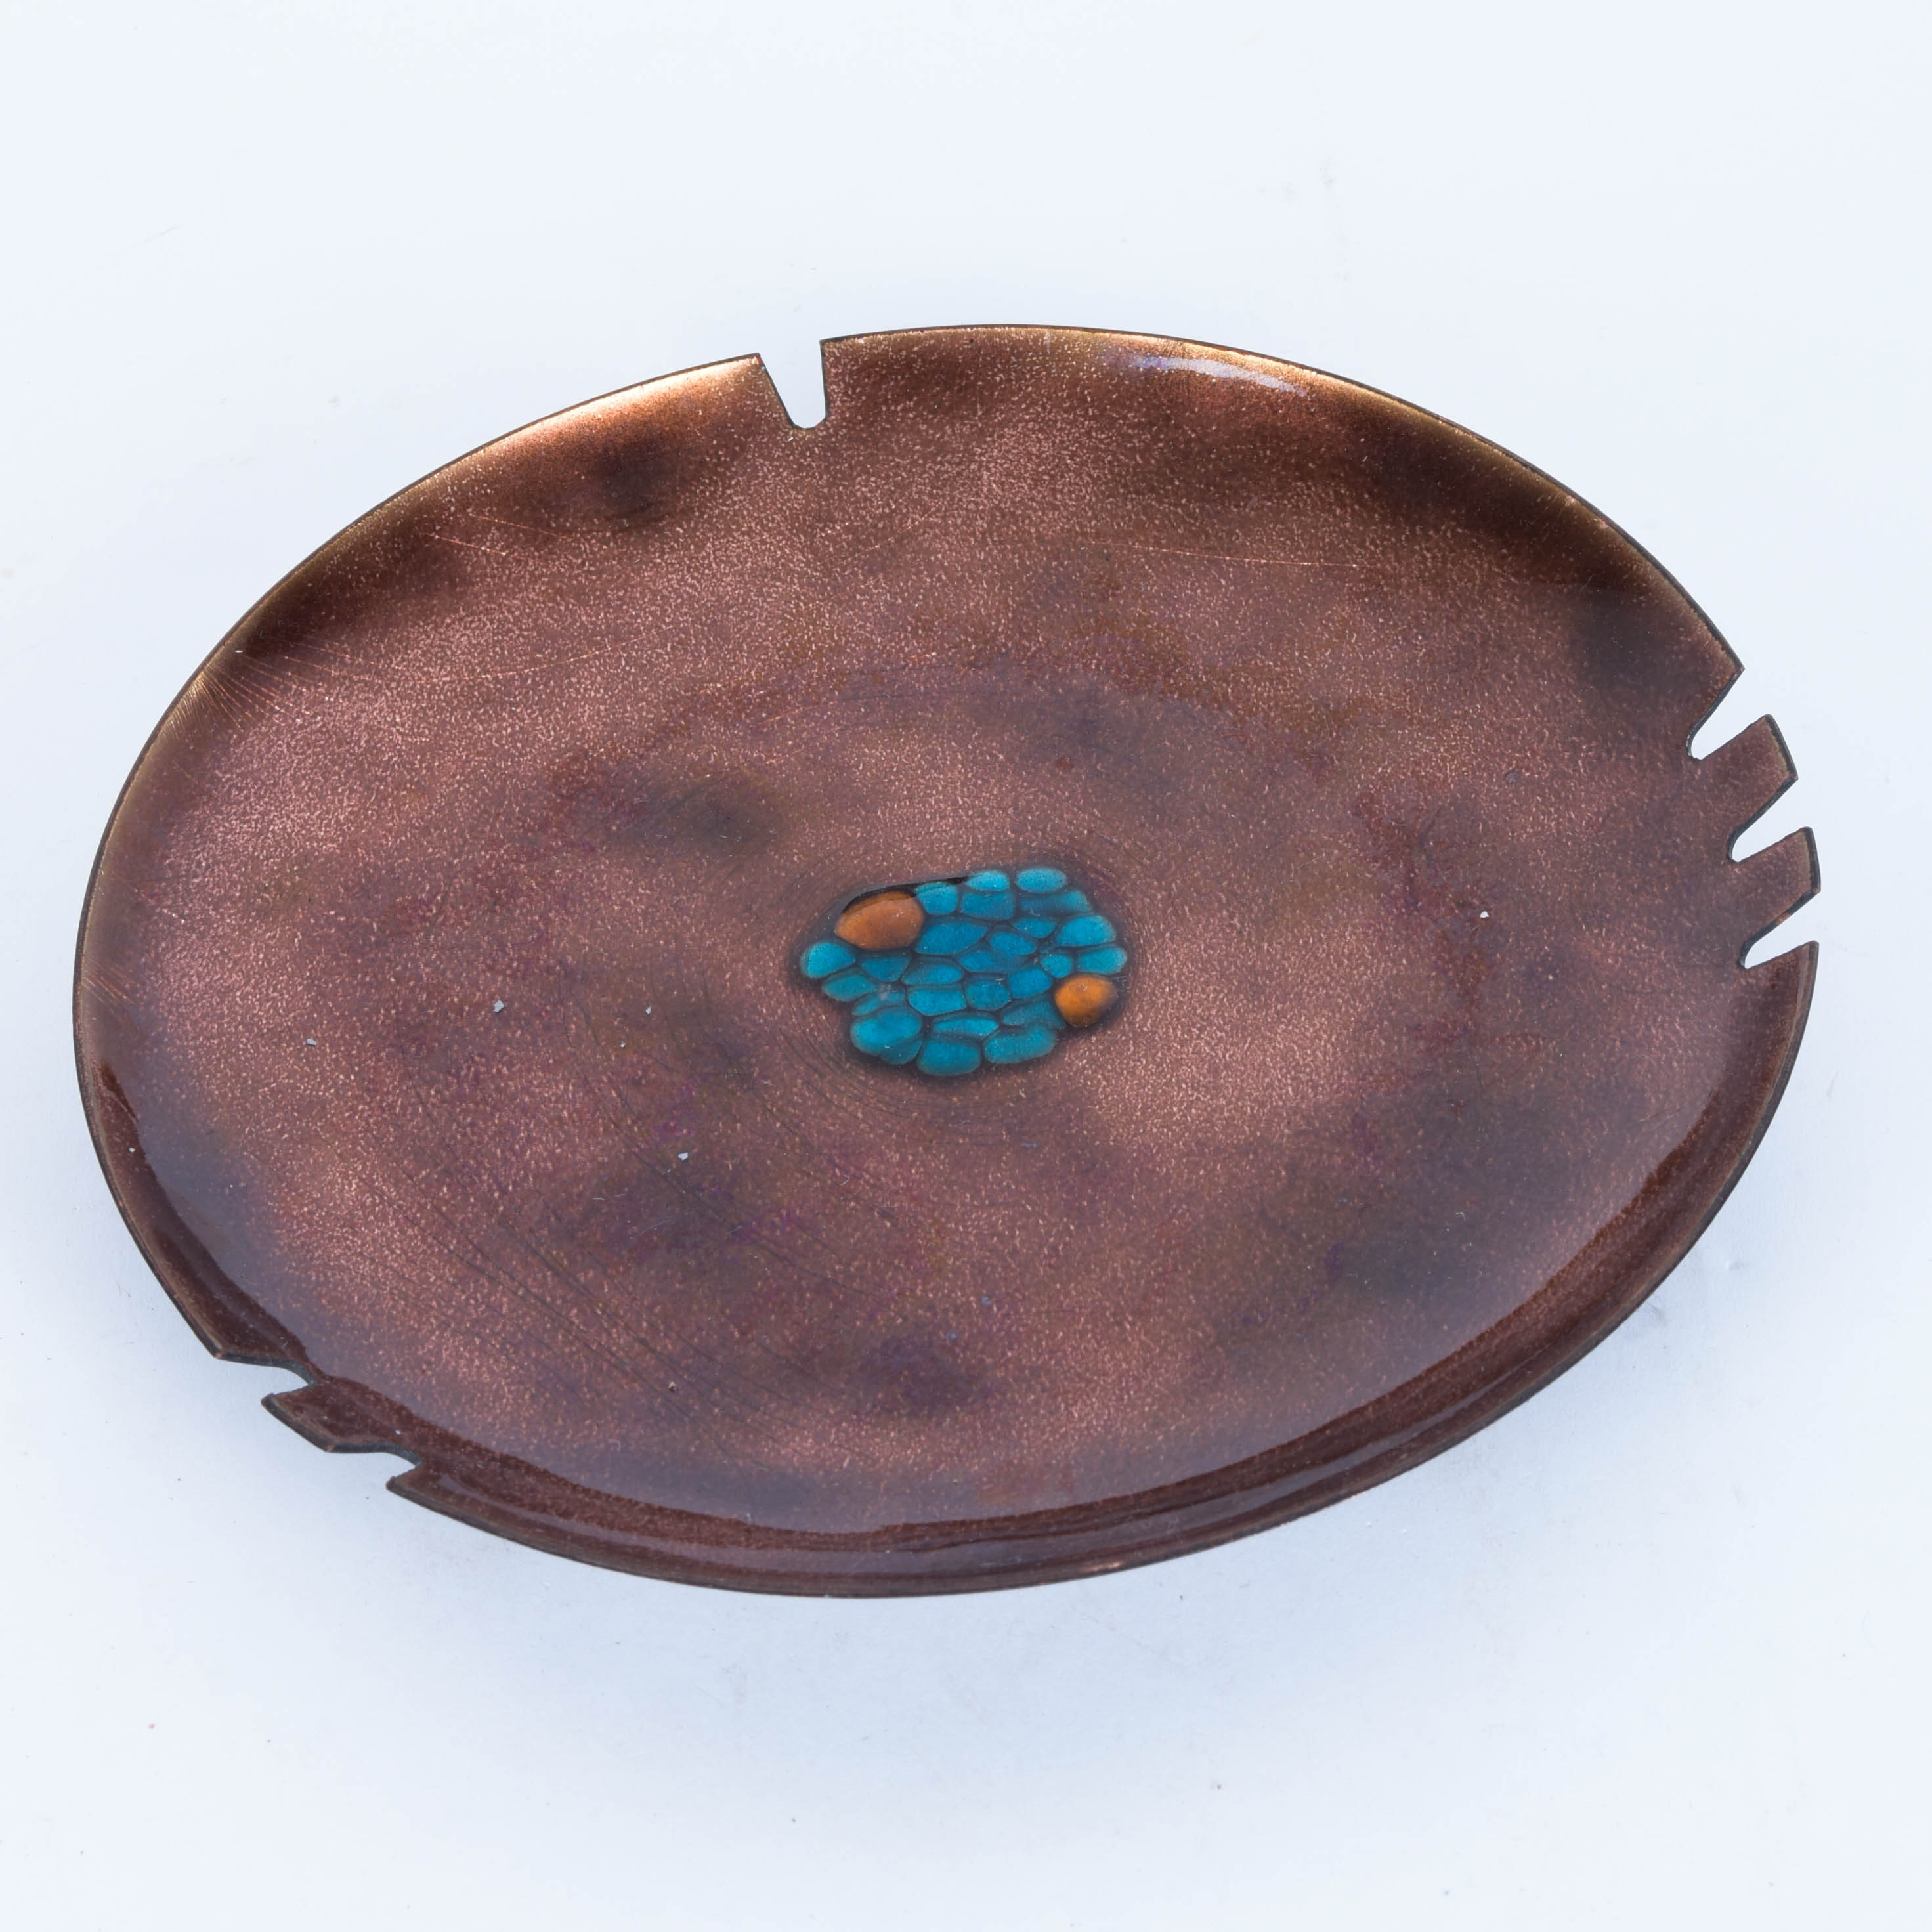 Copper and Enamel Ash Receiver